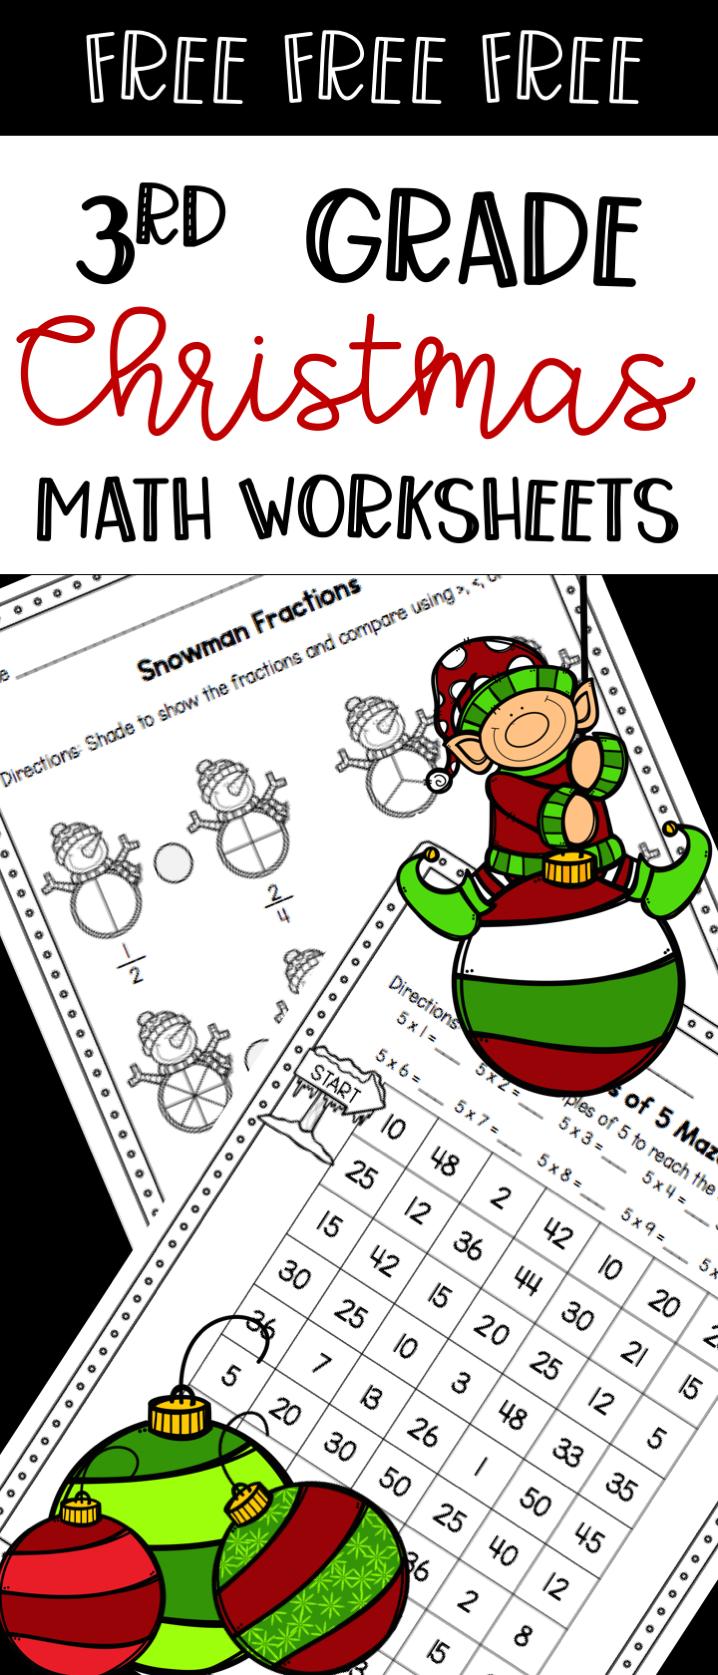 Free 3Rd Grade Christmas Math Worksheets - Comparing